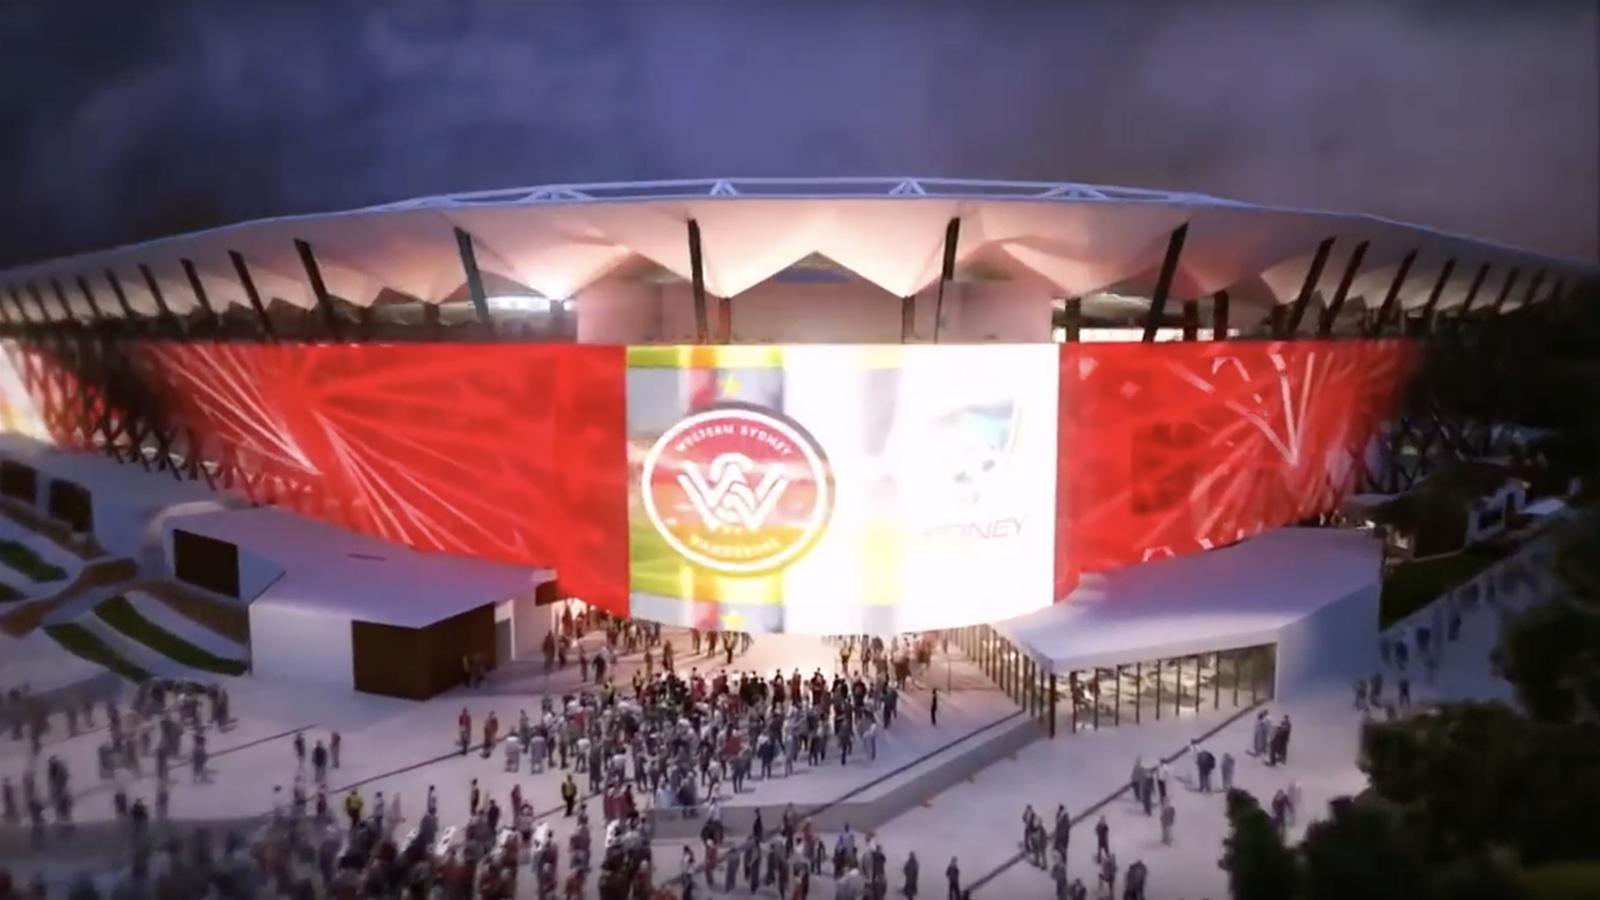 Inside the new Western Sydney Stadium